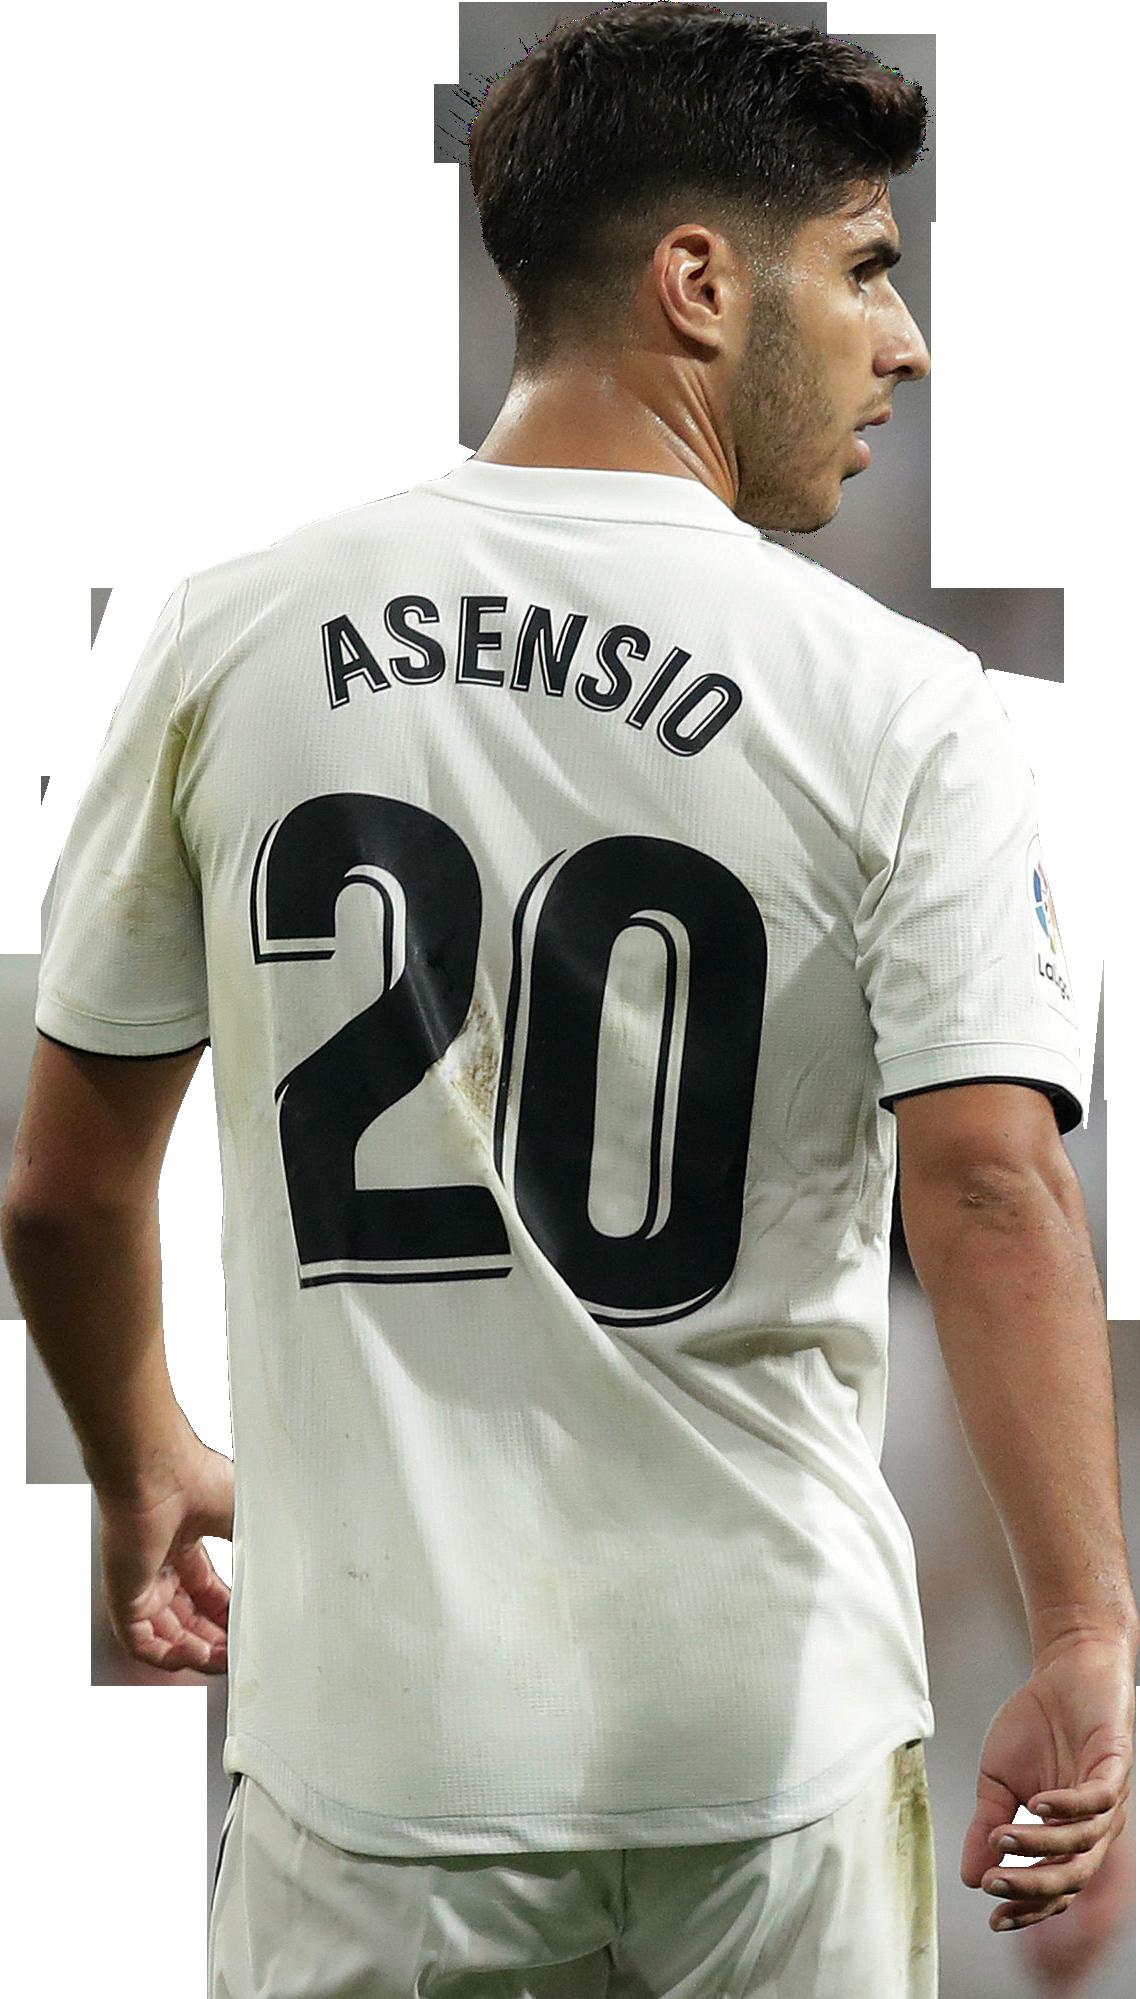 Marco Asensiorender